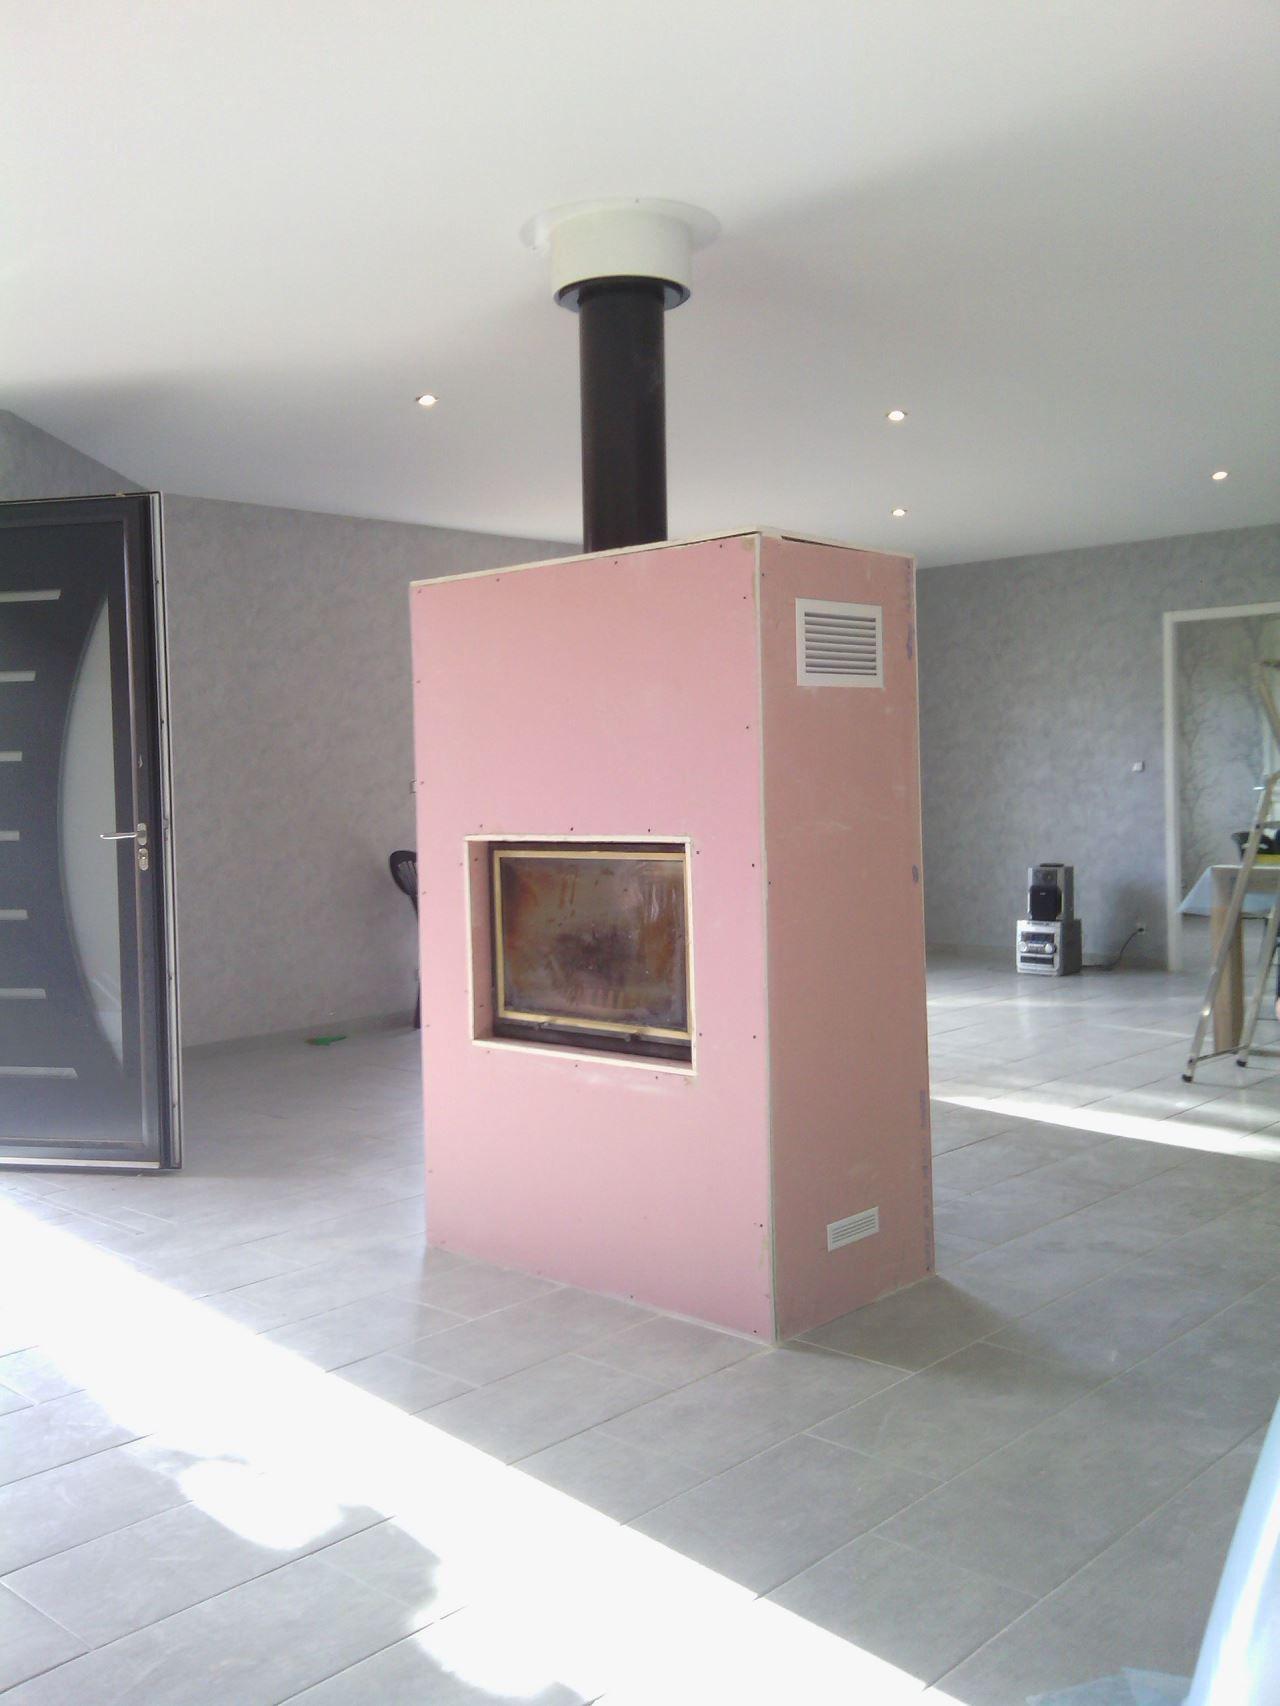 ramonage dijon bnj entreprise conduit gaz bois fuel tubage 21. Black Bedroom Furniture Sets. Home Design Ideas